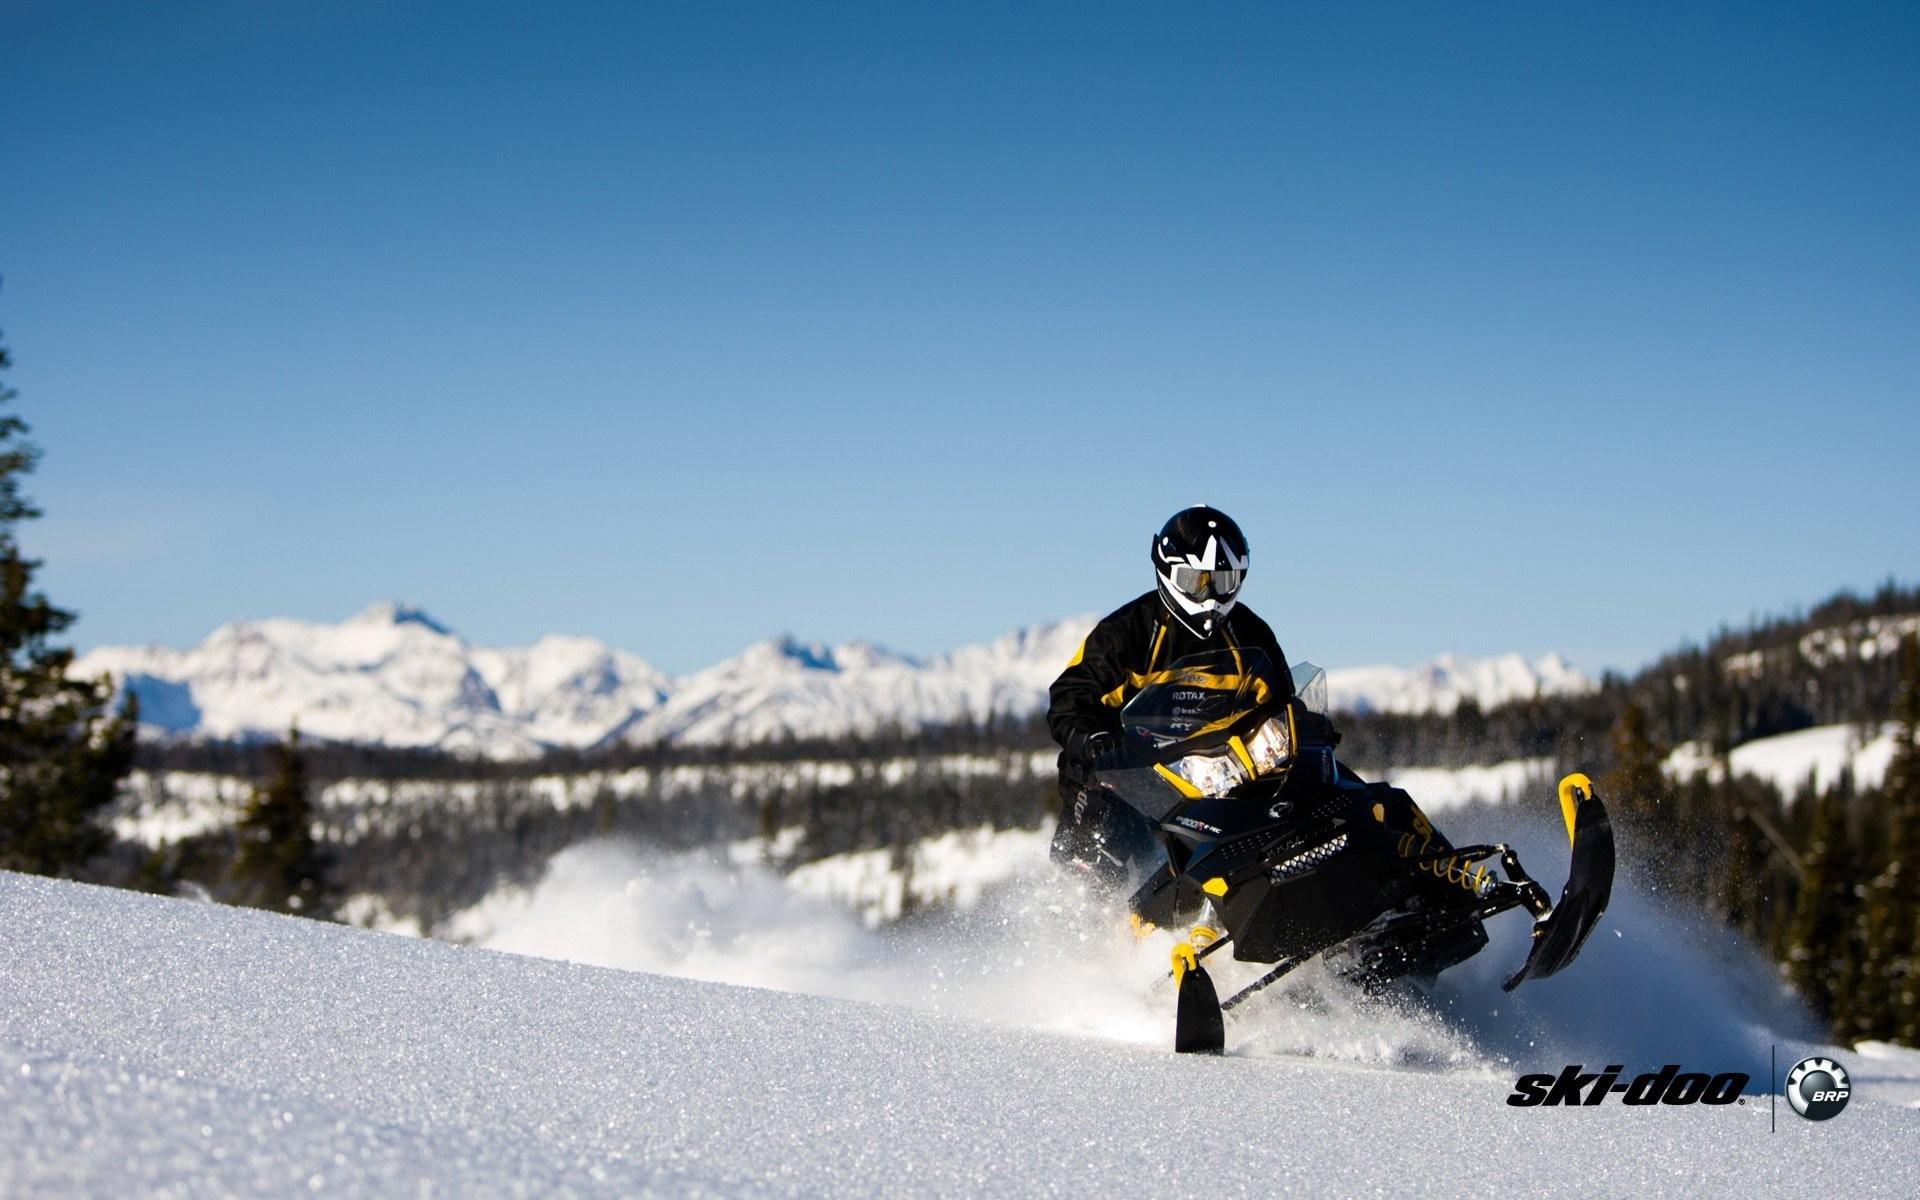 ski-doo skidoo renegade adrenaline snowmobile snowmobiles brp snow snow  forest sports sport